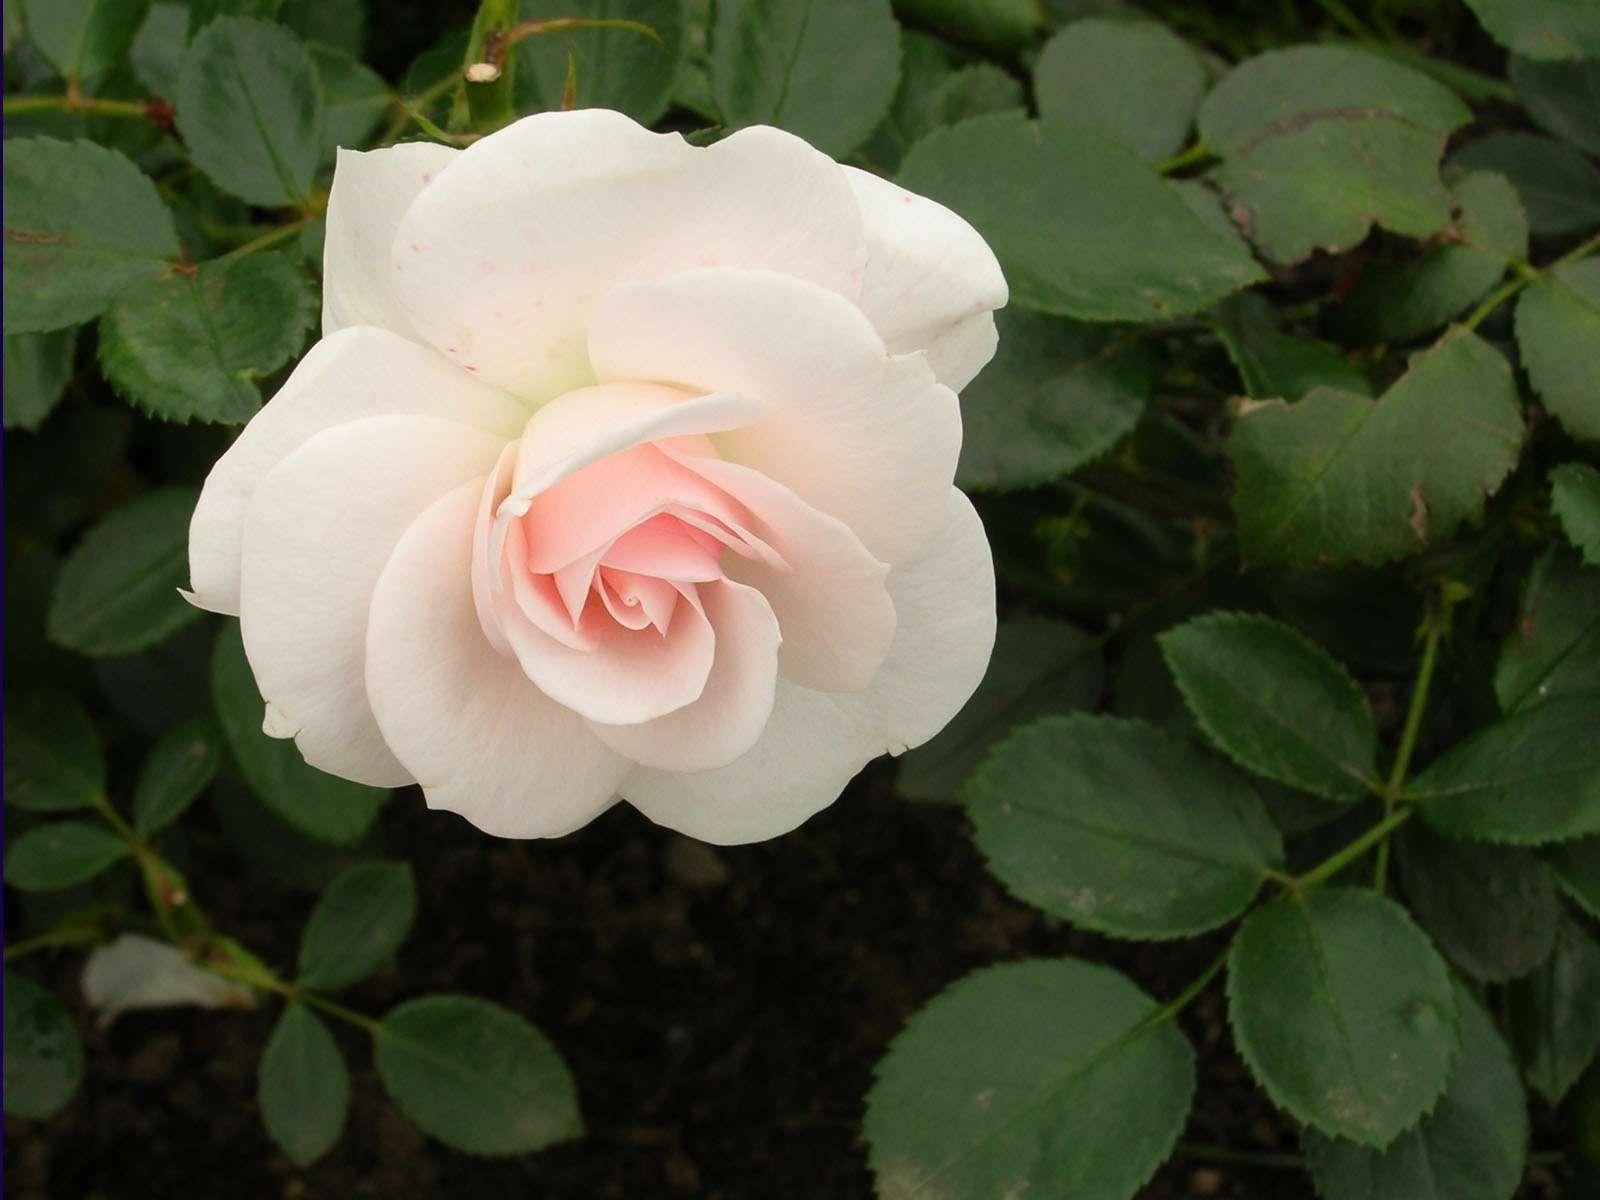 گل رز سفيد گنجینه تصاویر تبيان